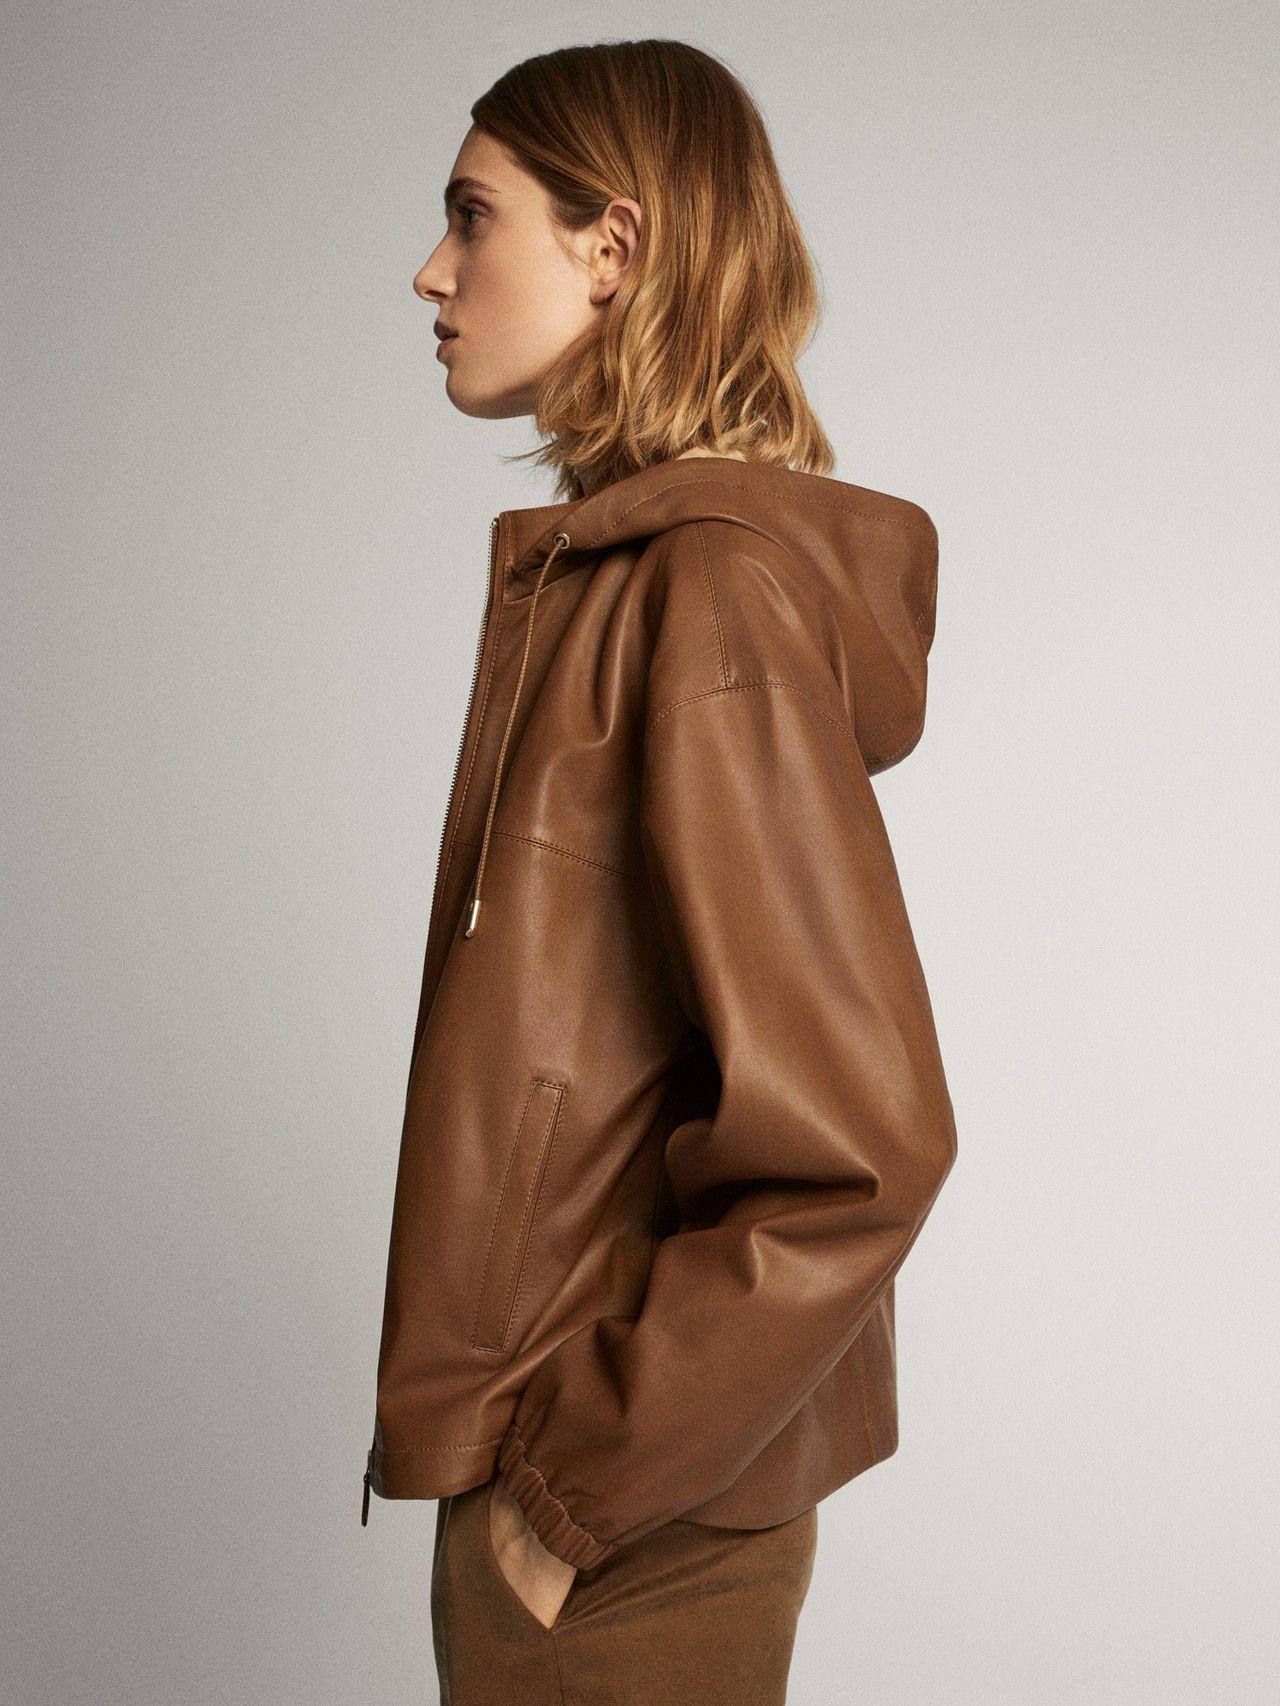 Massimo Dutti Mujer Cazadora Napa Capucha Marron M Jackets Jackets For Women Fashion